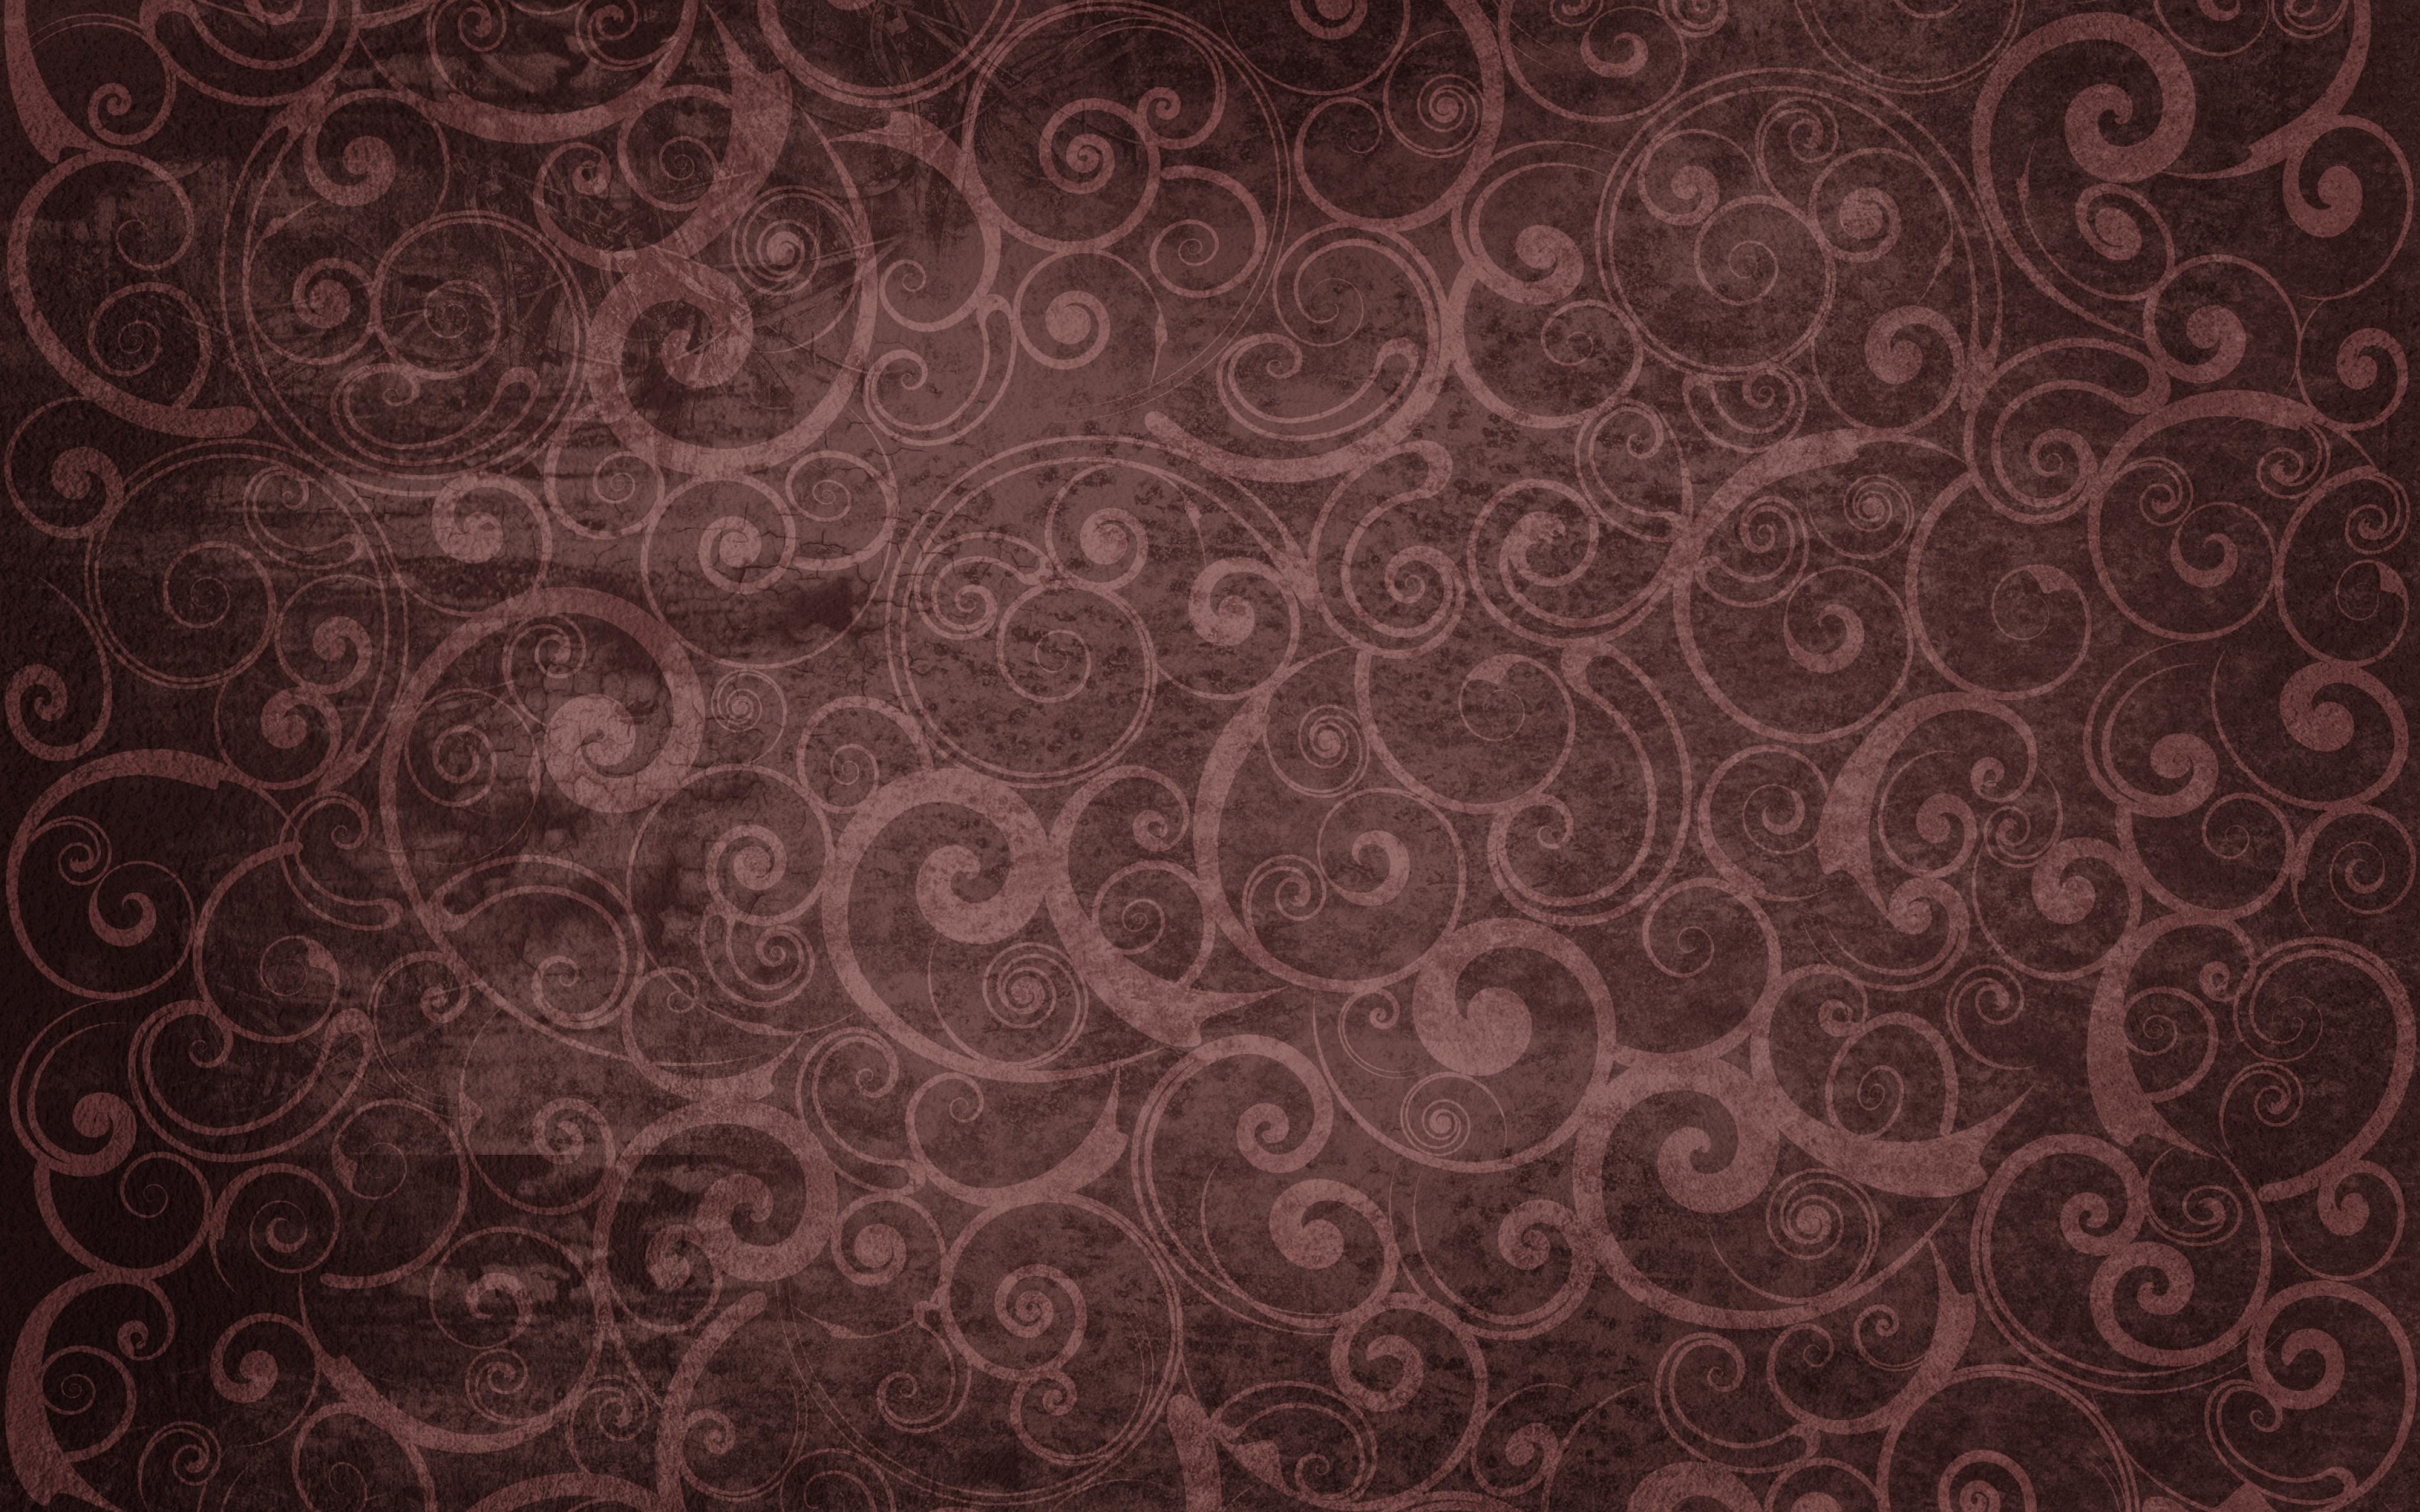 Curls Old Spiral Pattern Dark Wallpaper Background Ultra HD 4K 3840x2400